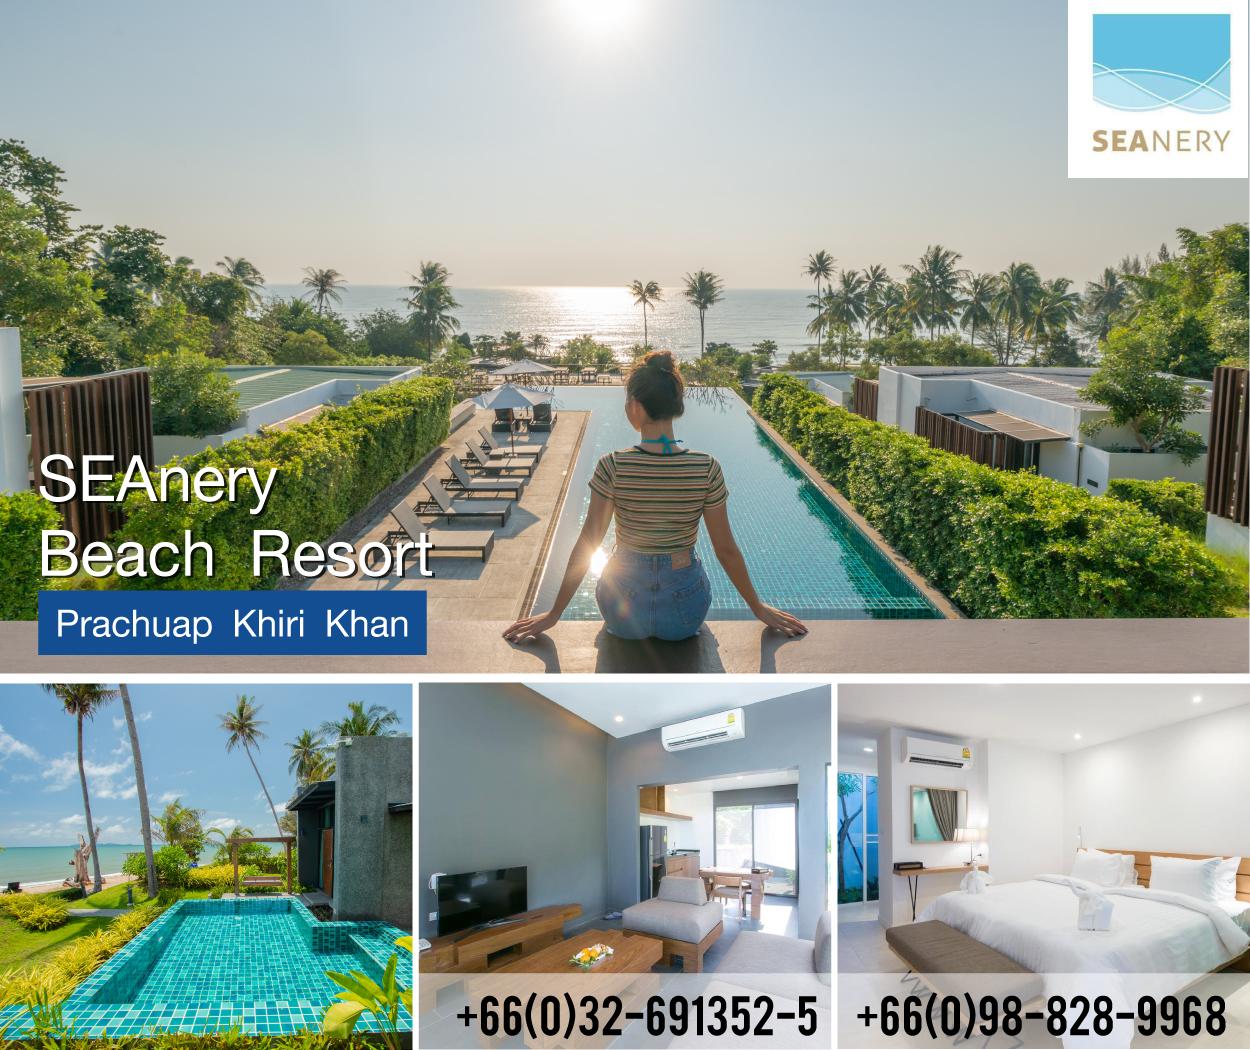 Seanery Beach Resort Prachuap Khiri Khan